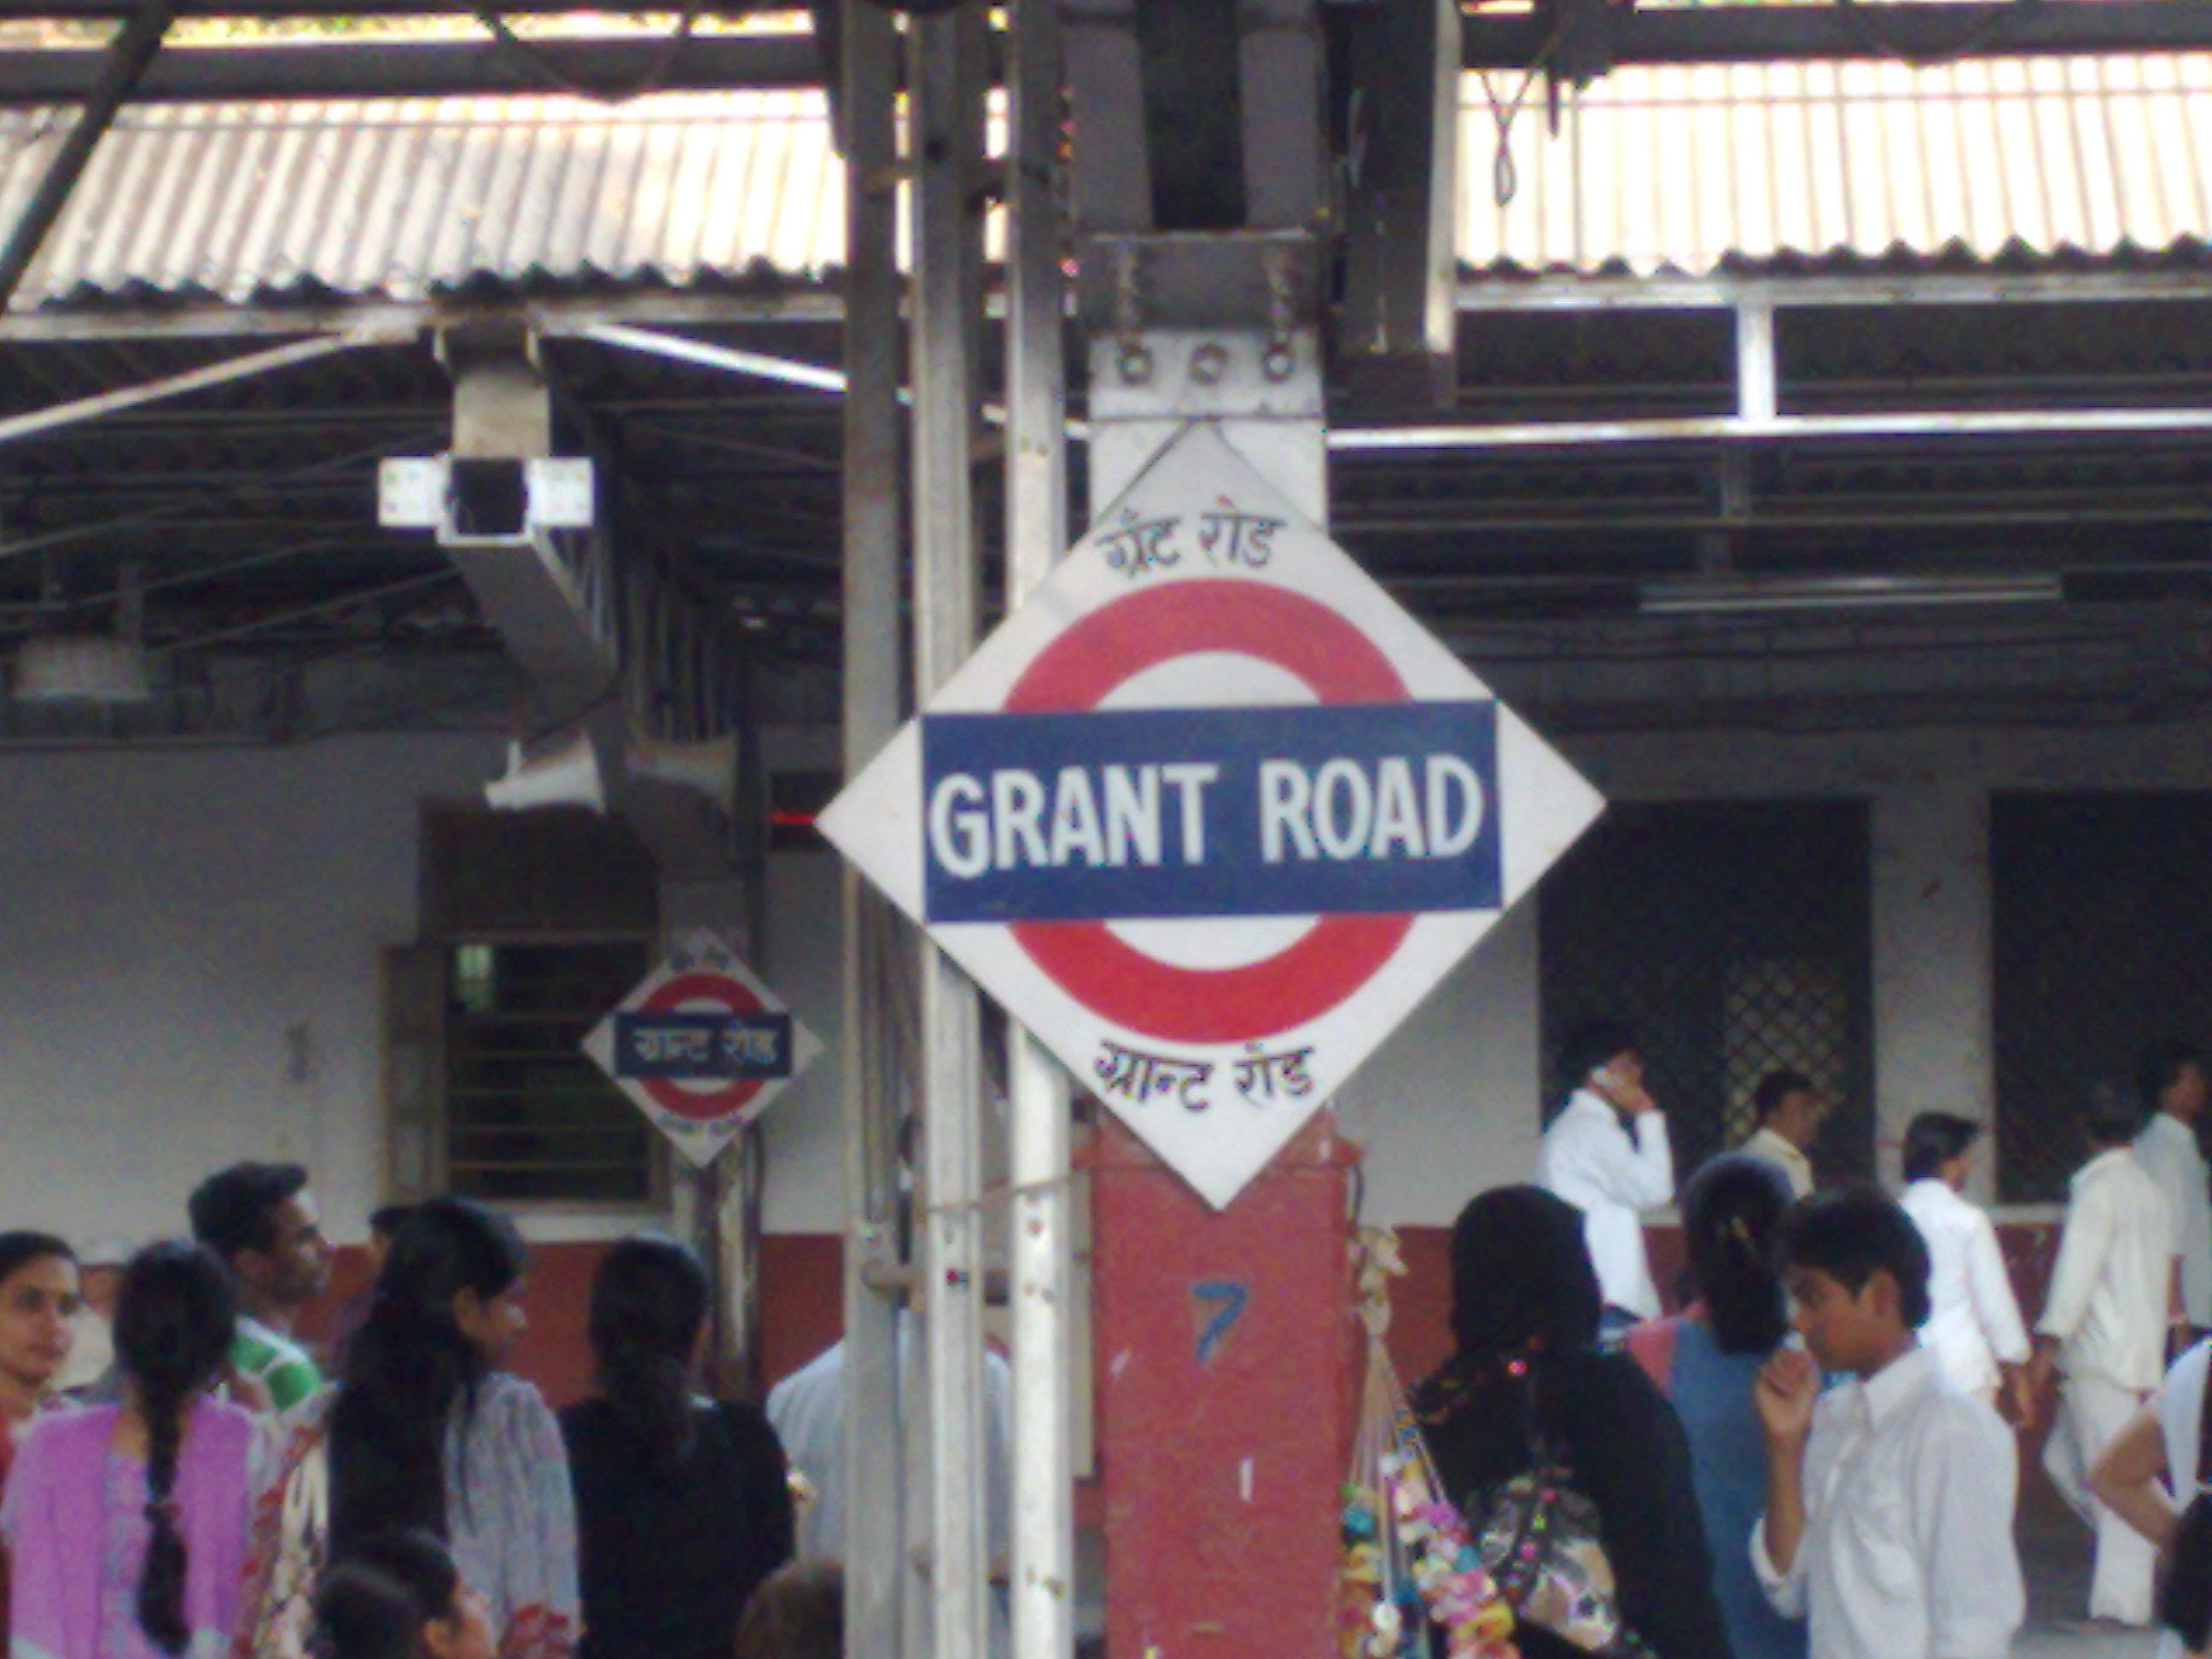 File:Grant Road jpg - Wikimedia Commons